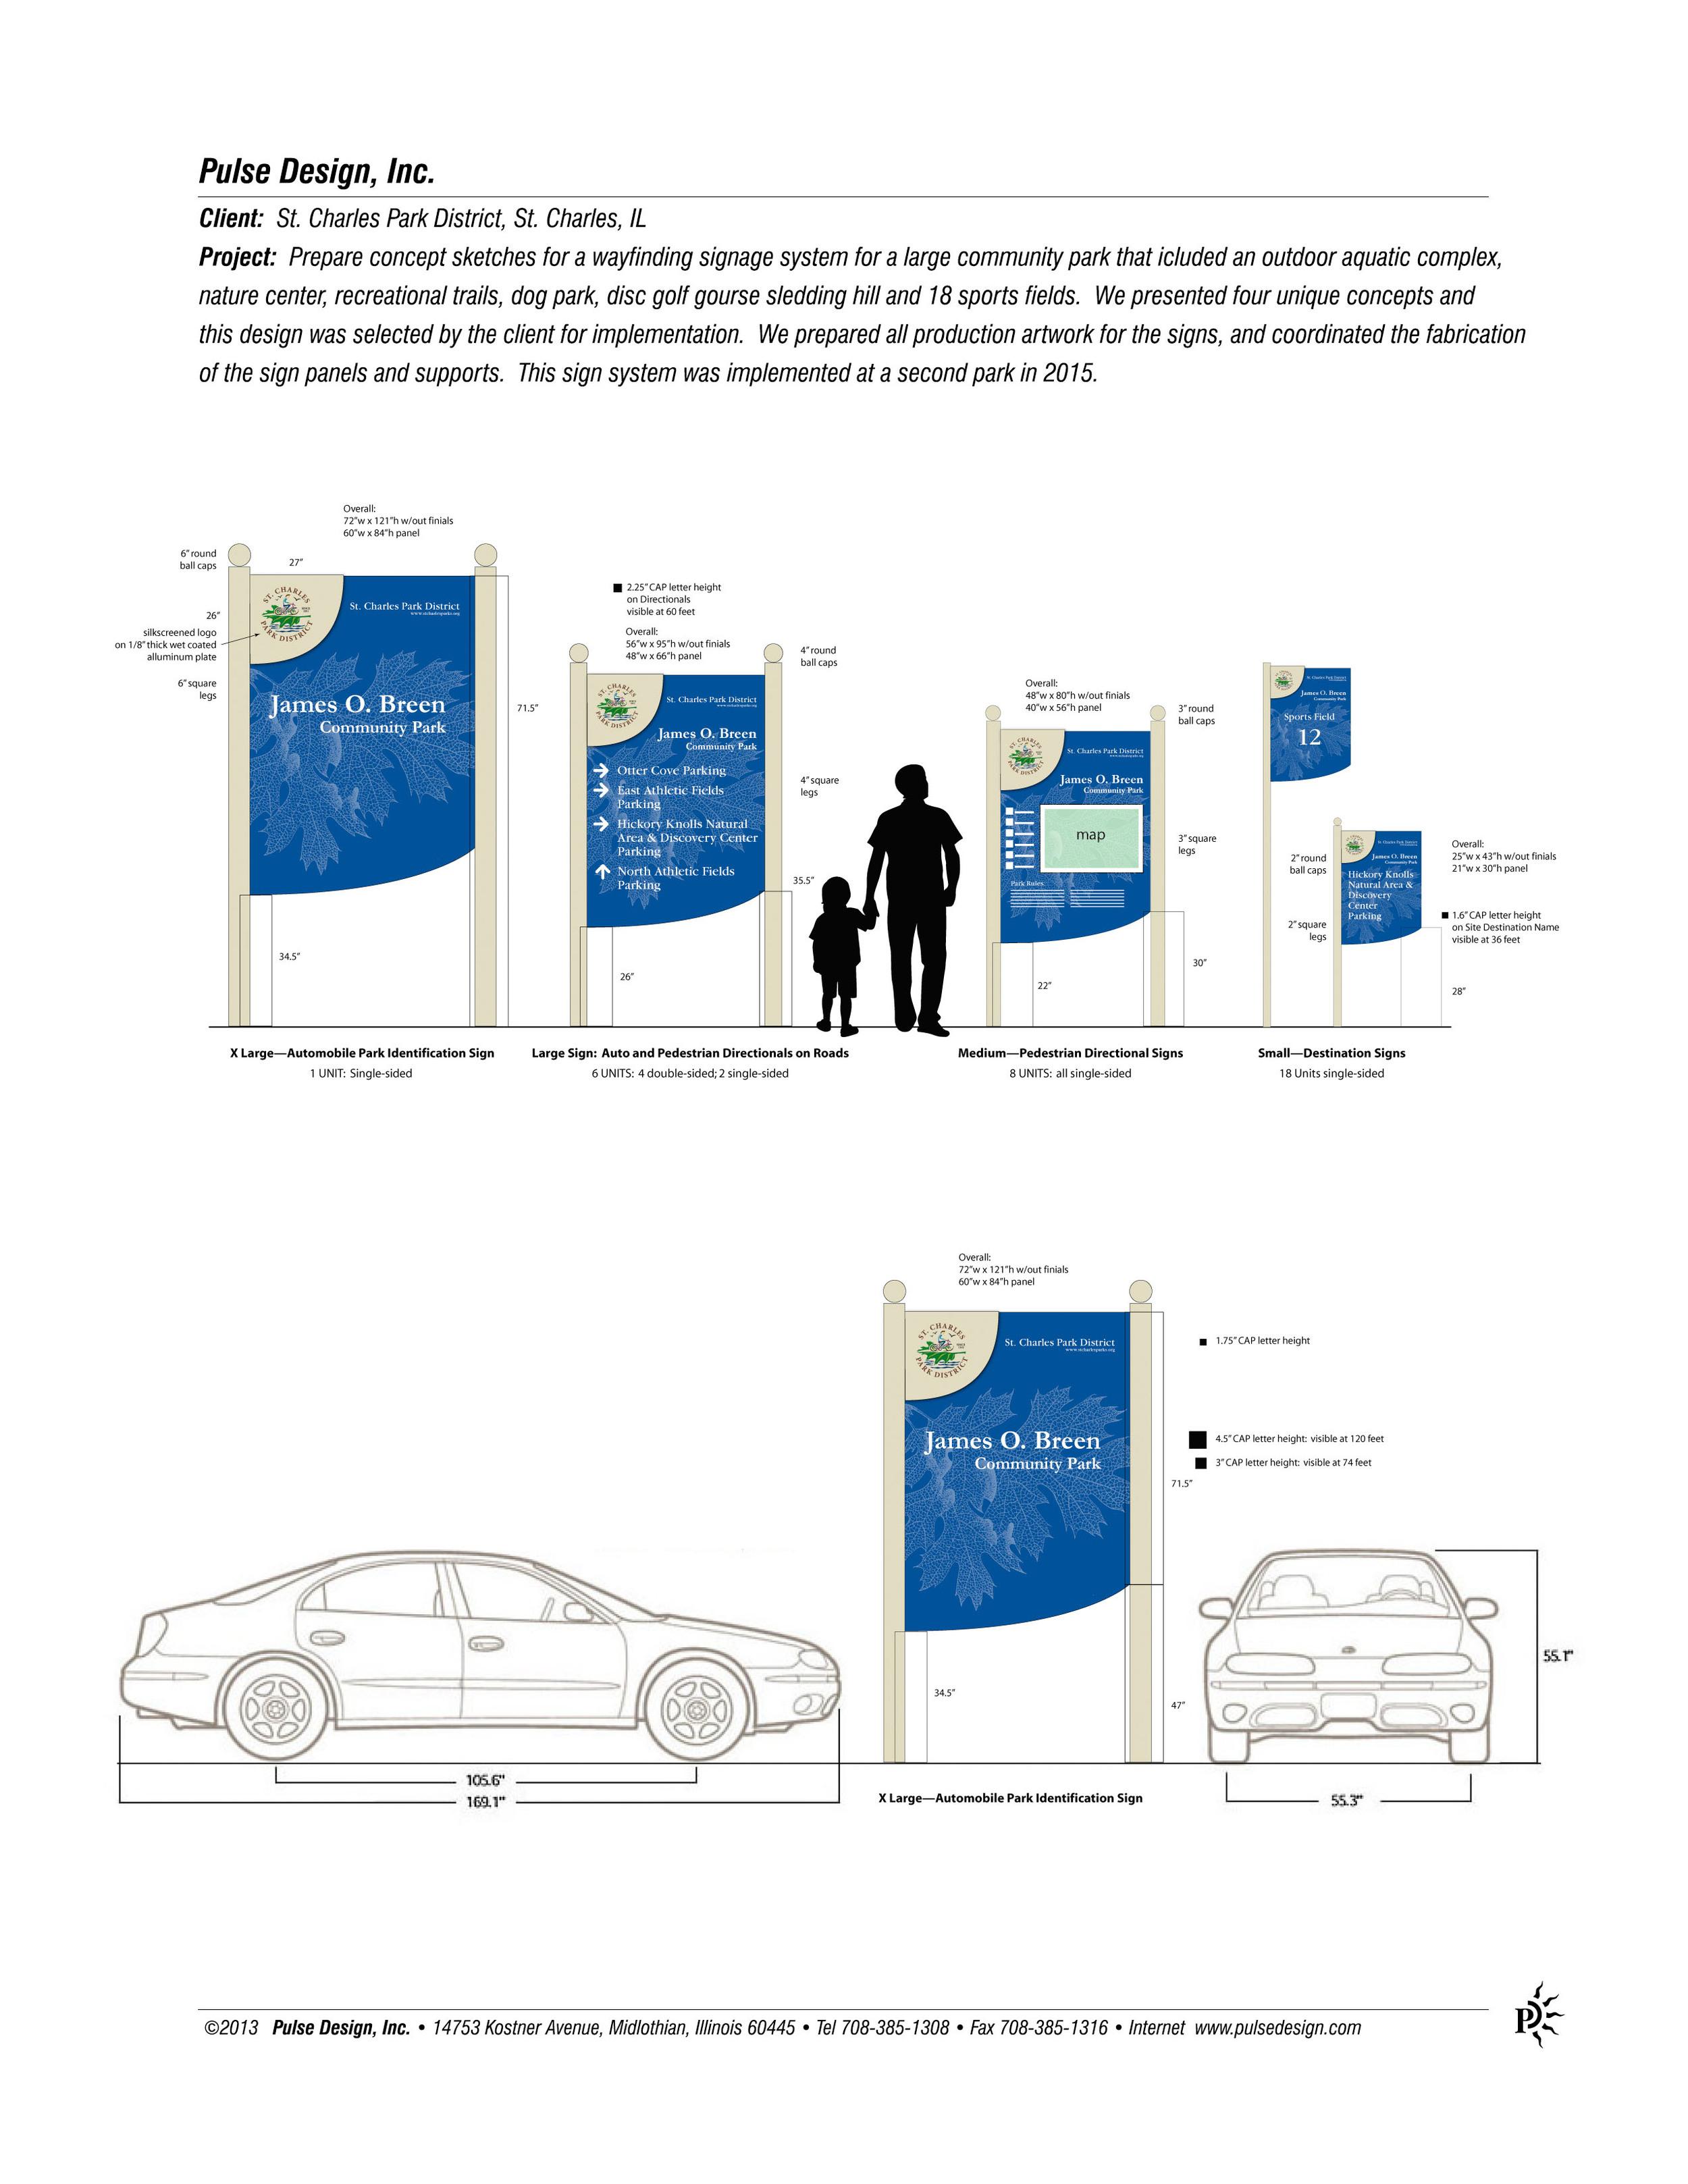 St-Charles-Park-Wayfinding-Signs-Pulse-Design-Inc.jpg